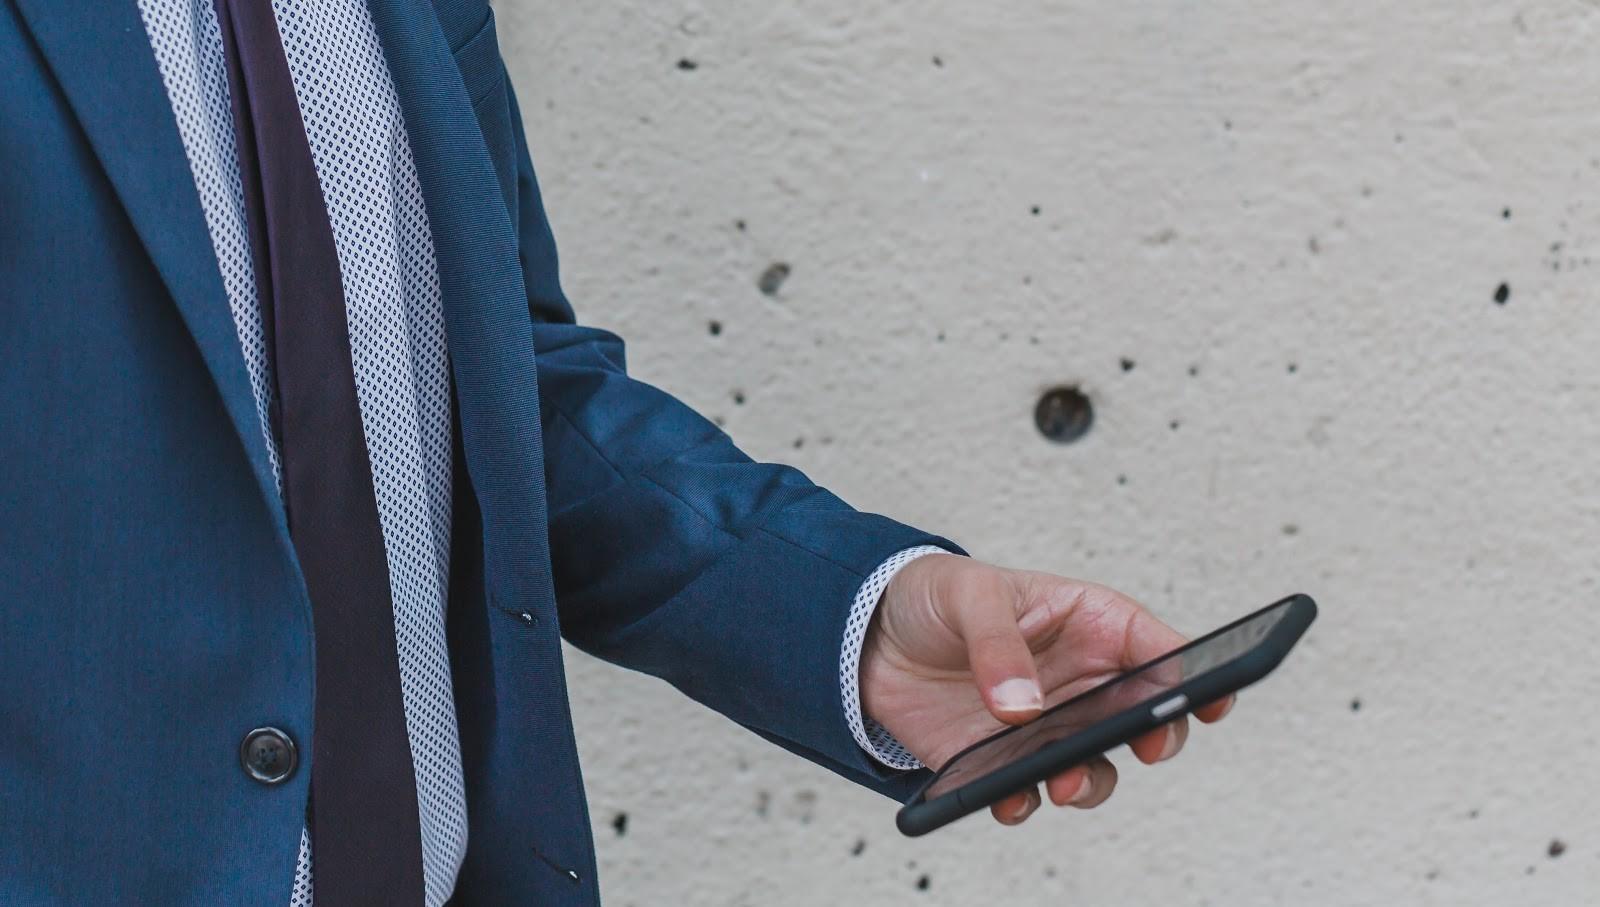 Web ja mobiilileimaus